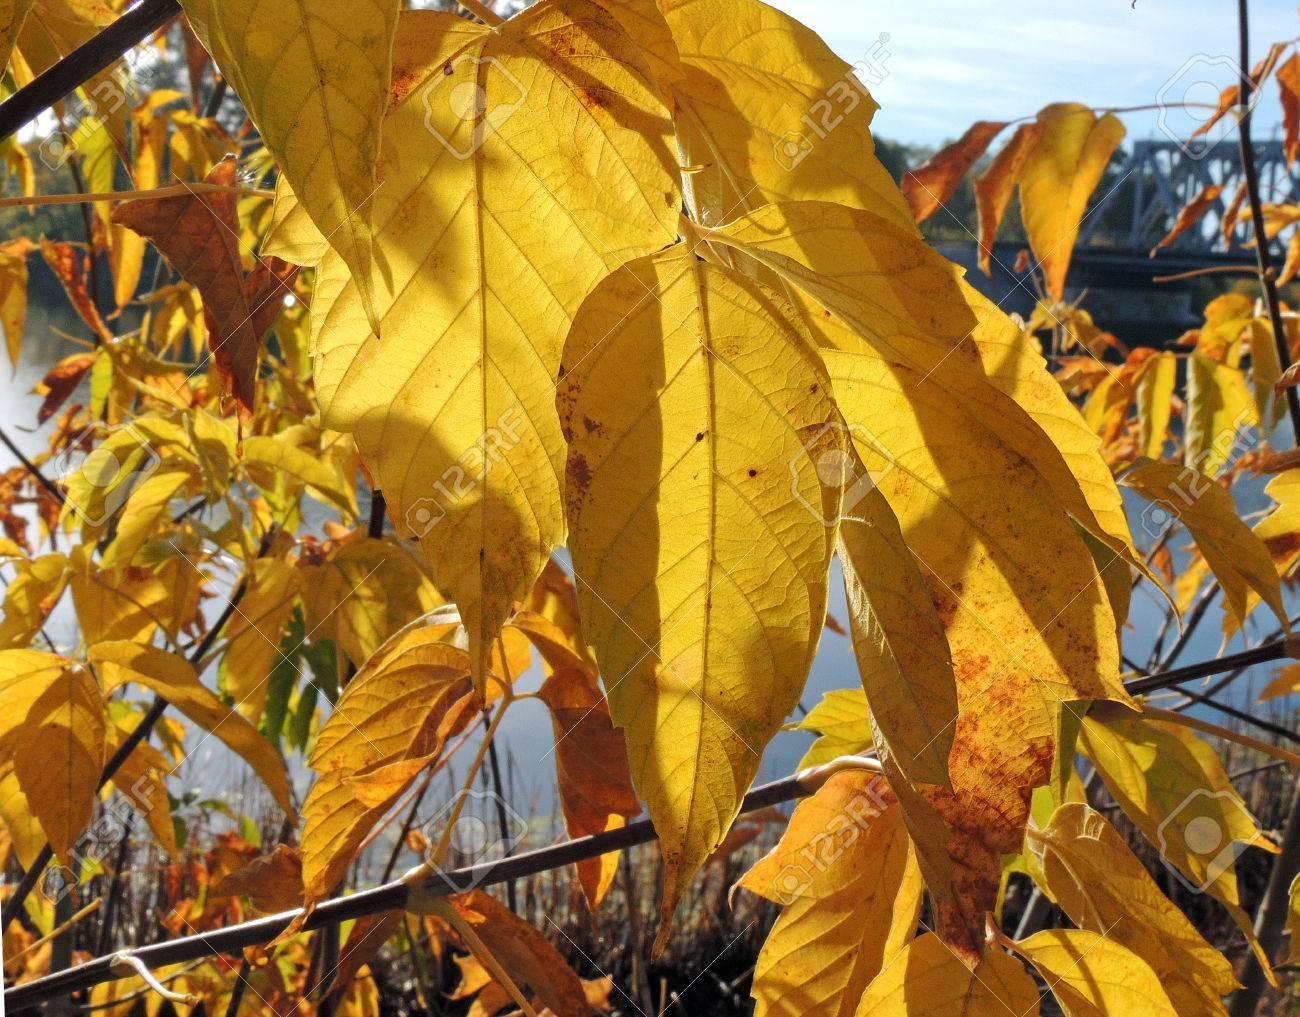 Autumnal Foliage Of Box Elder Or Boxelder Maple Or Ash Leaved